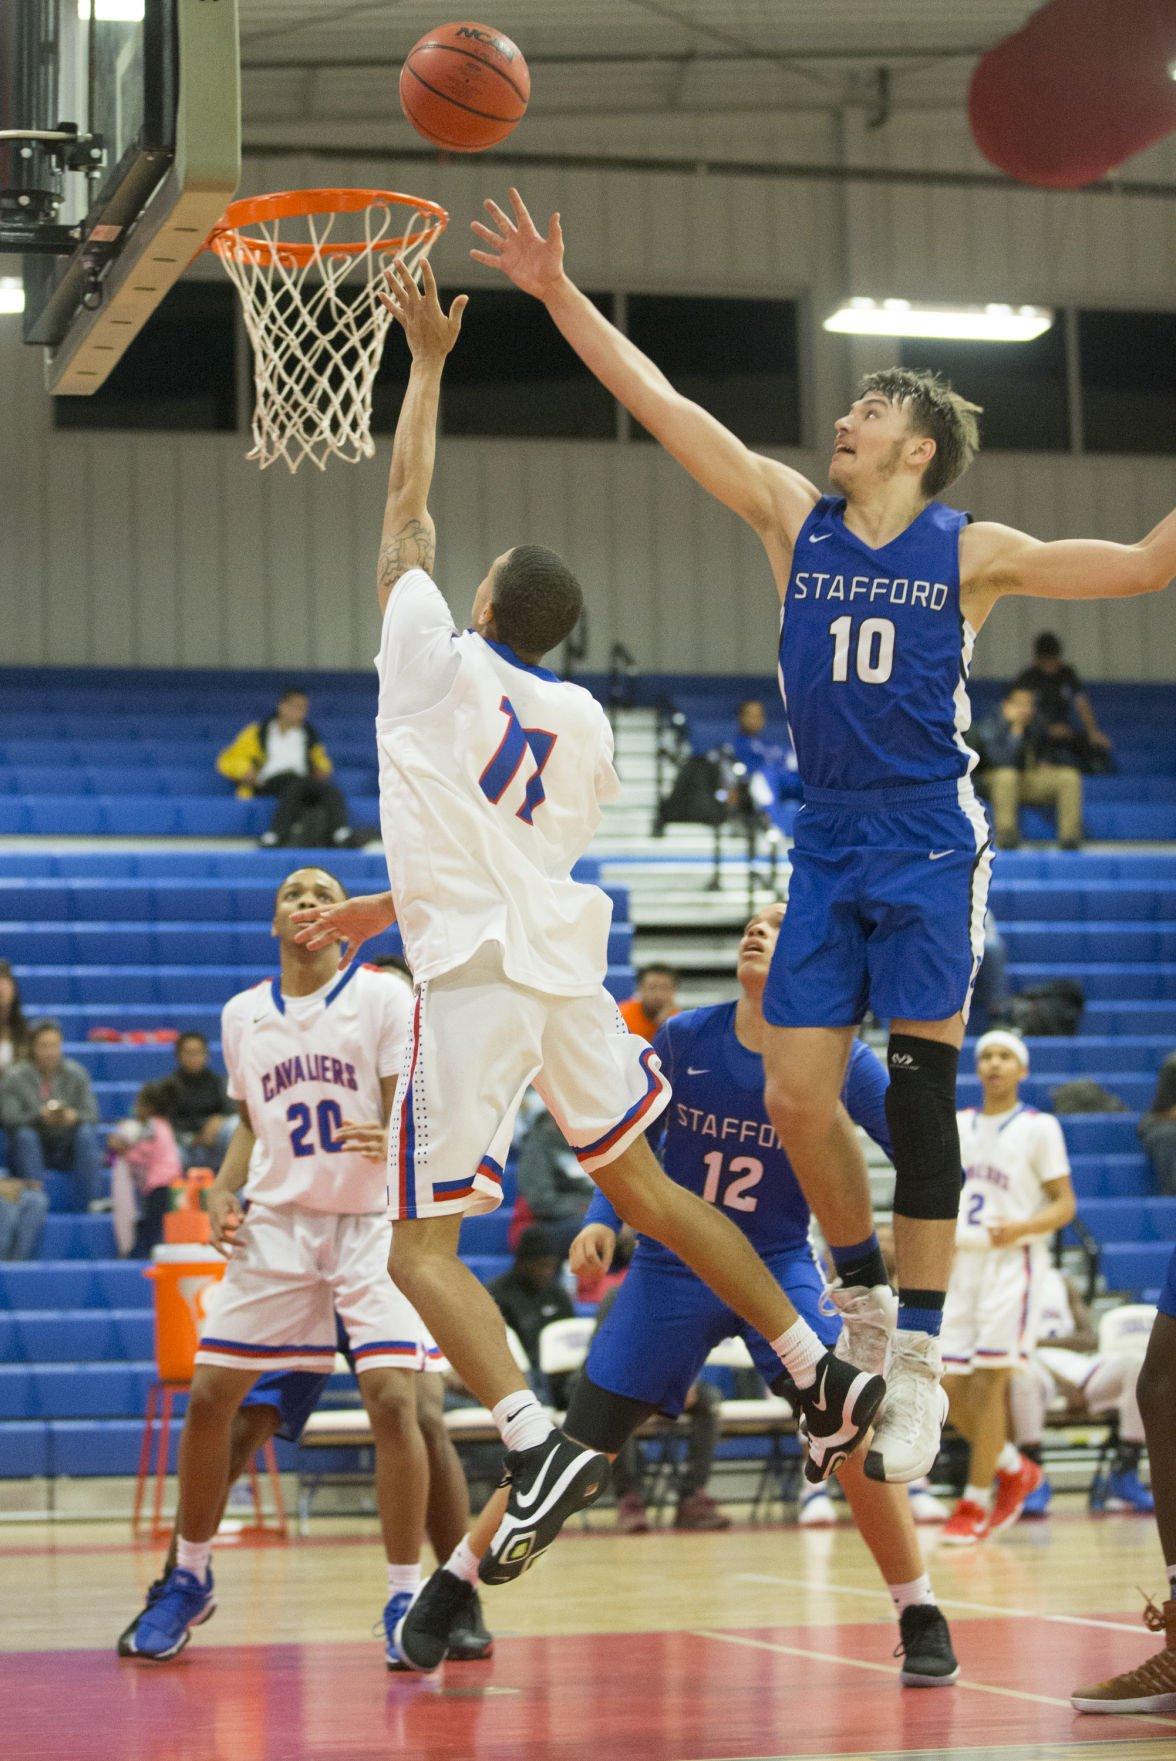 Caroline vs Stafford boys basketball